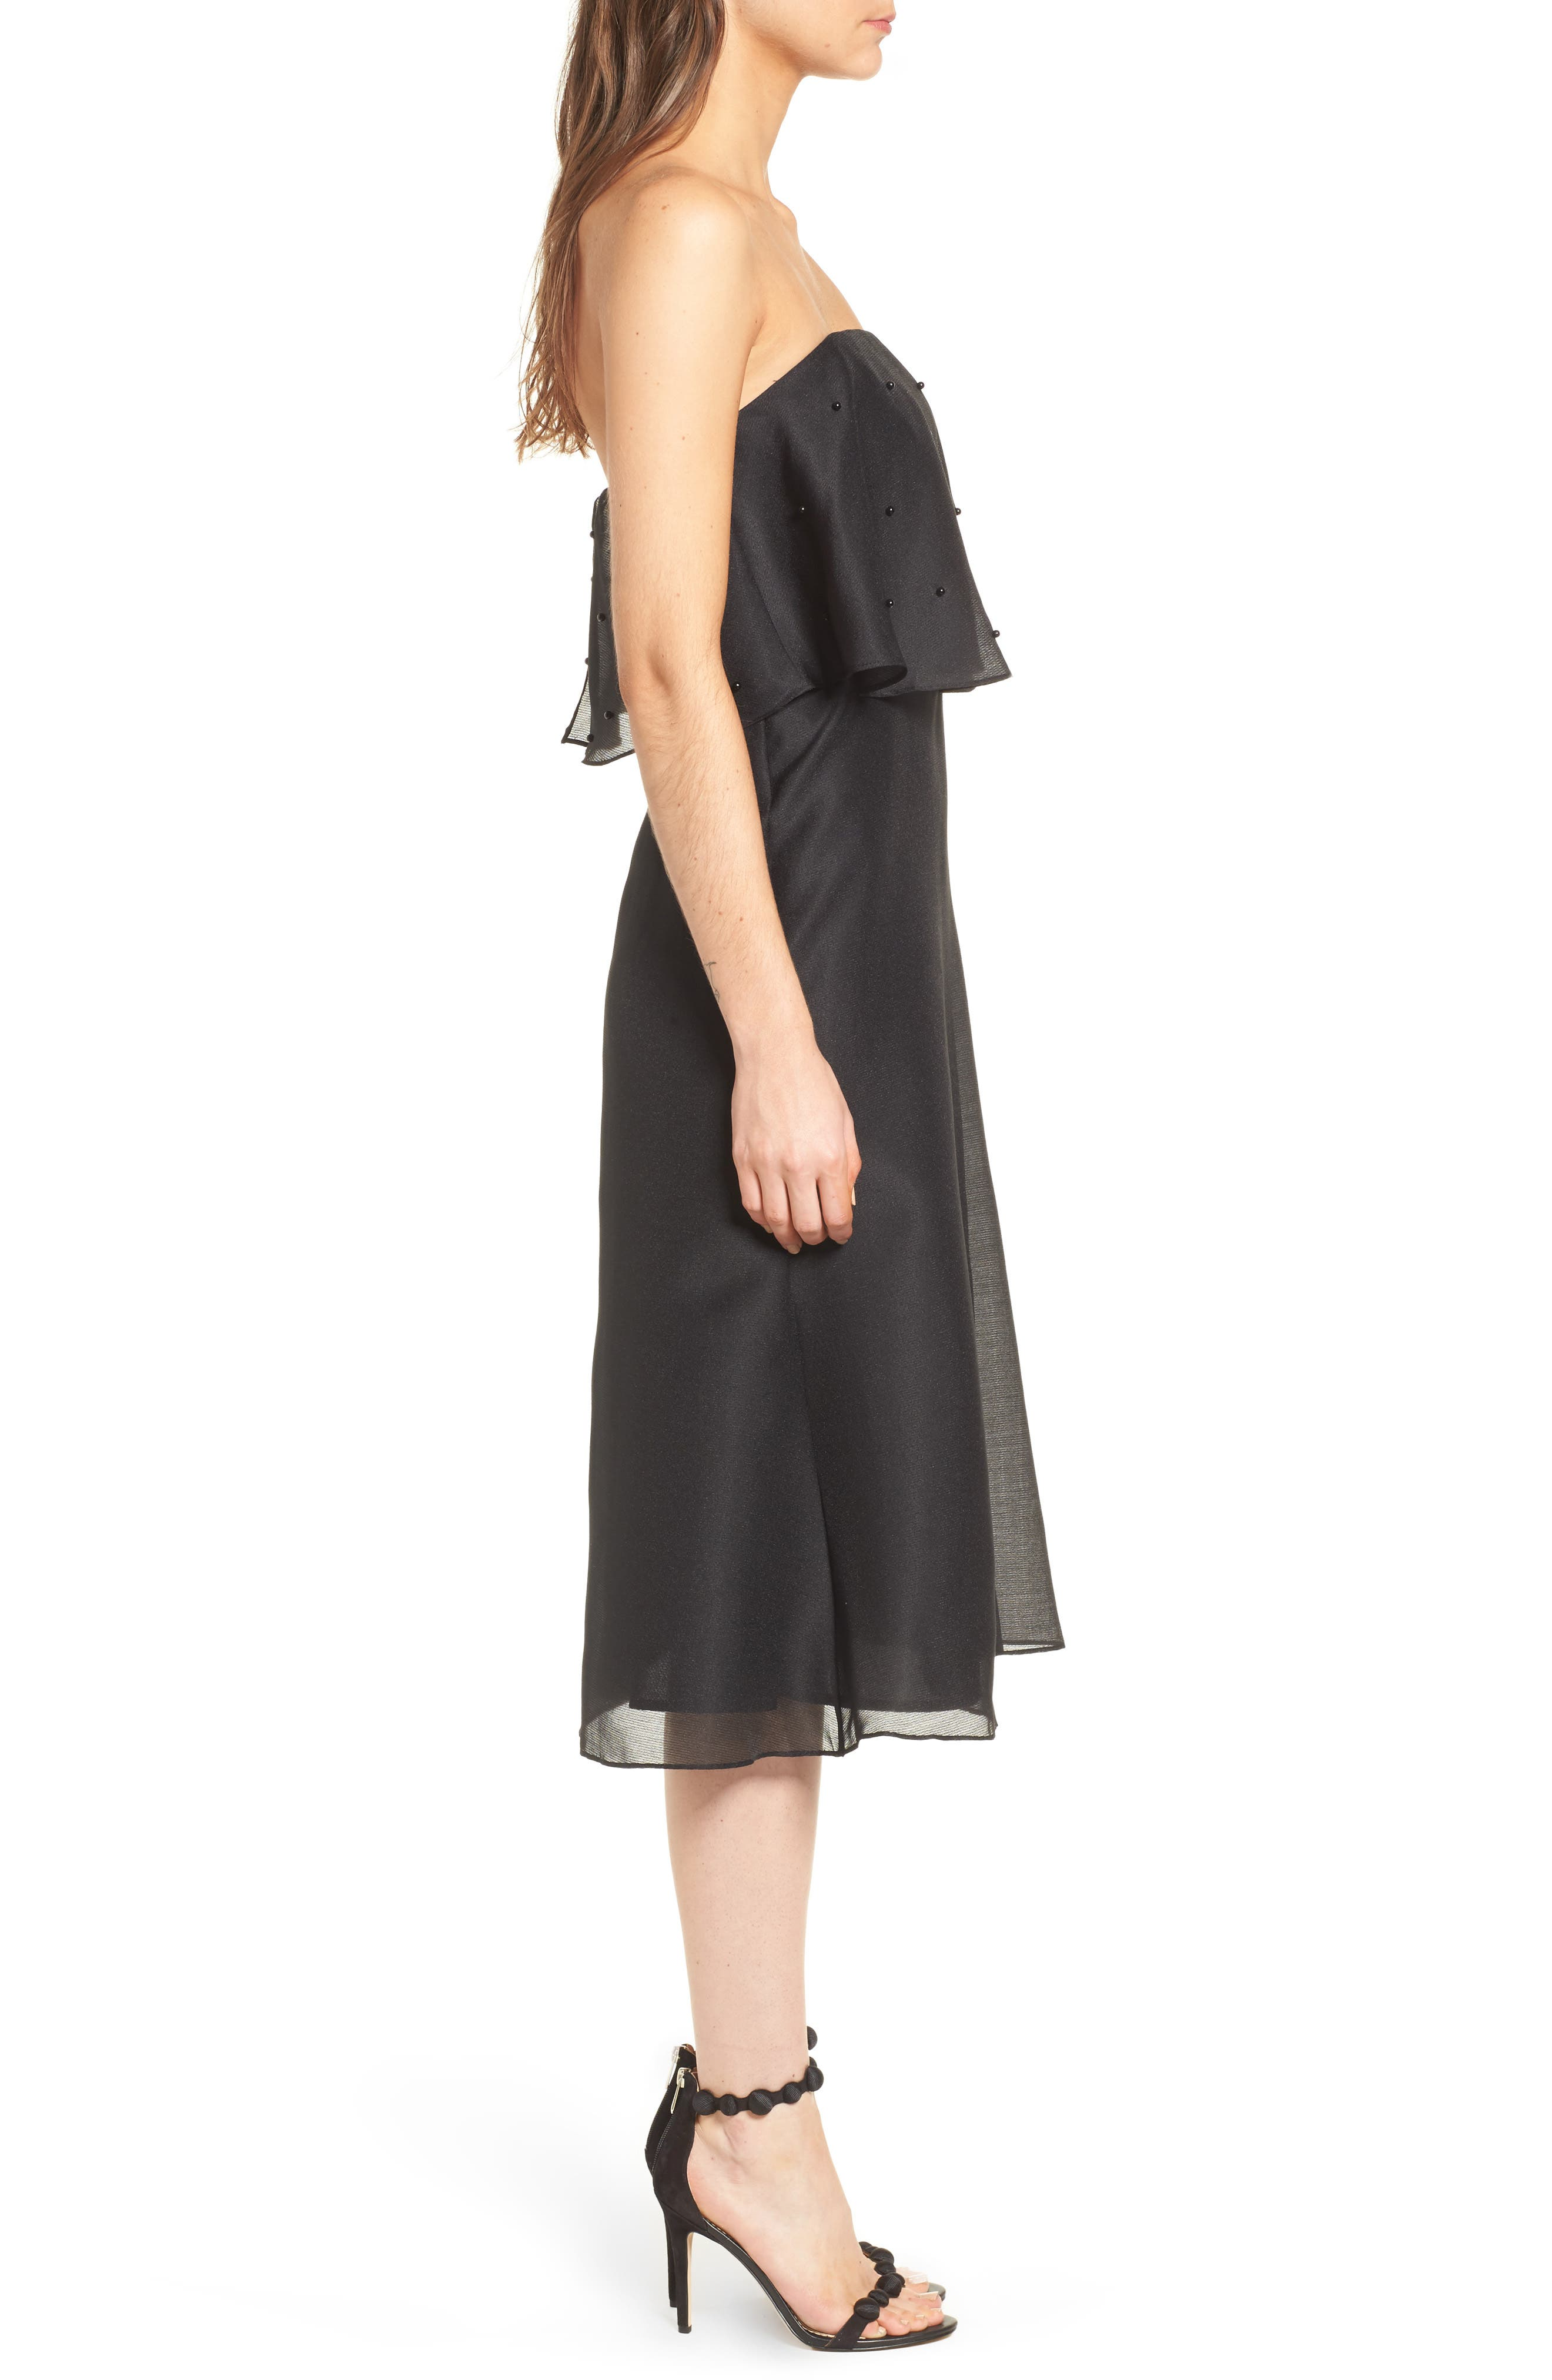 Call Me Strapless Dress,                             Alternate thumbnail 4, color,                             Black